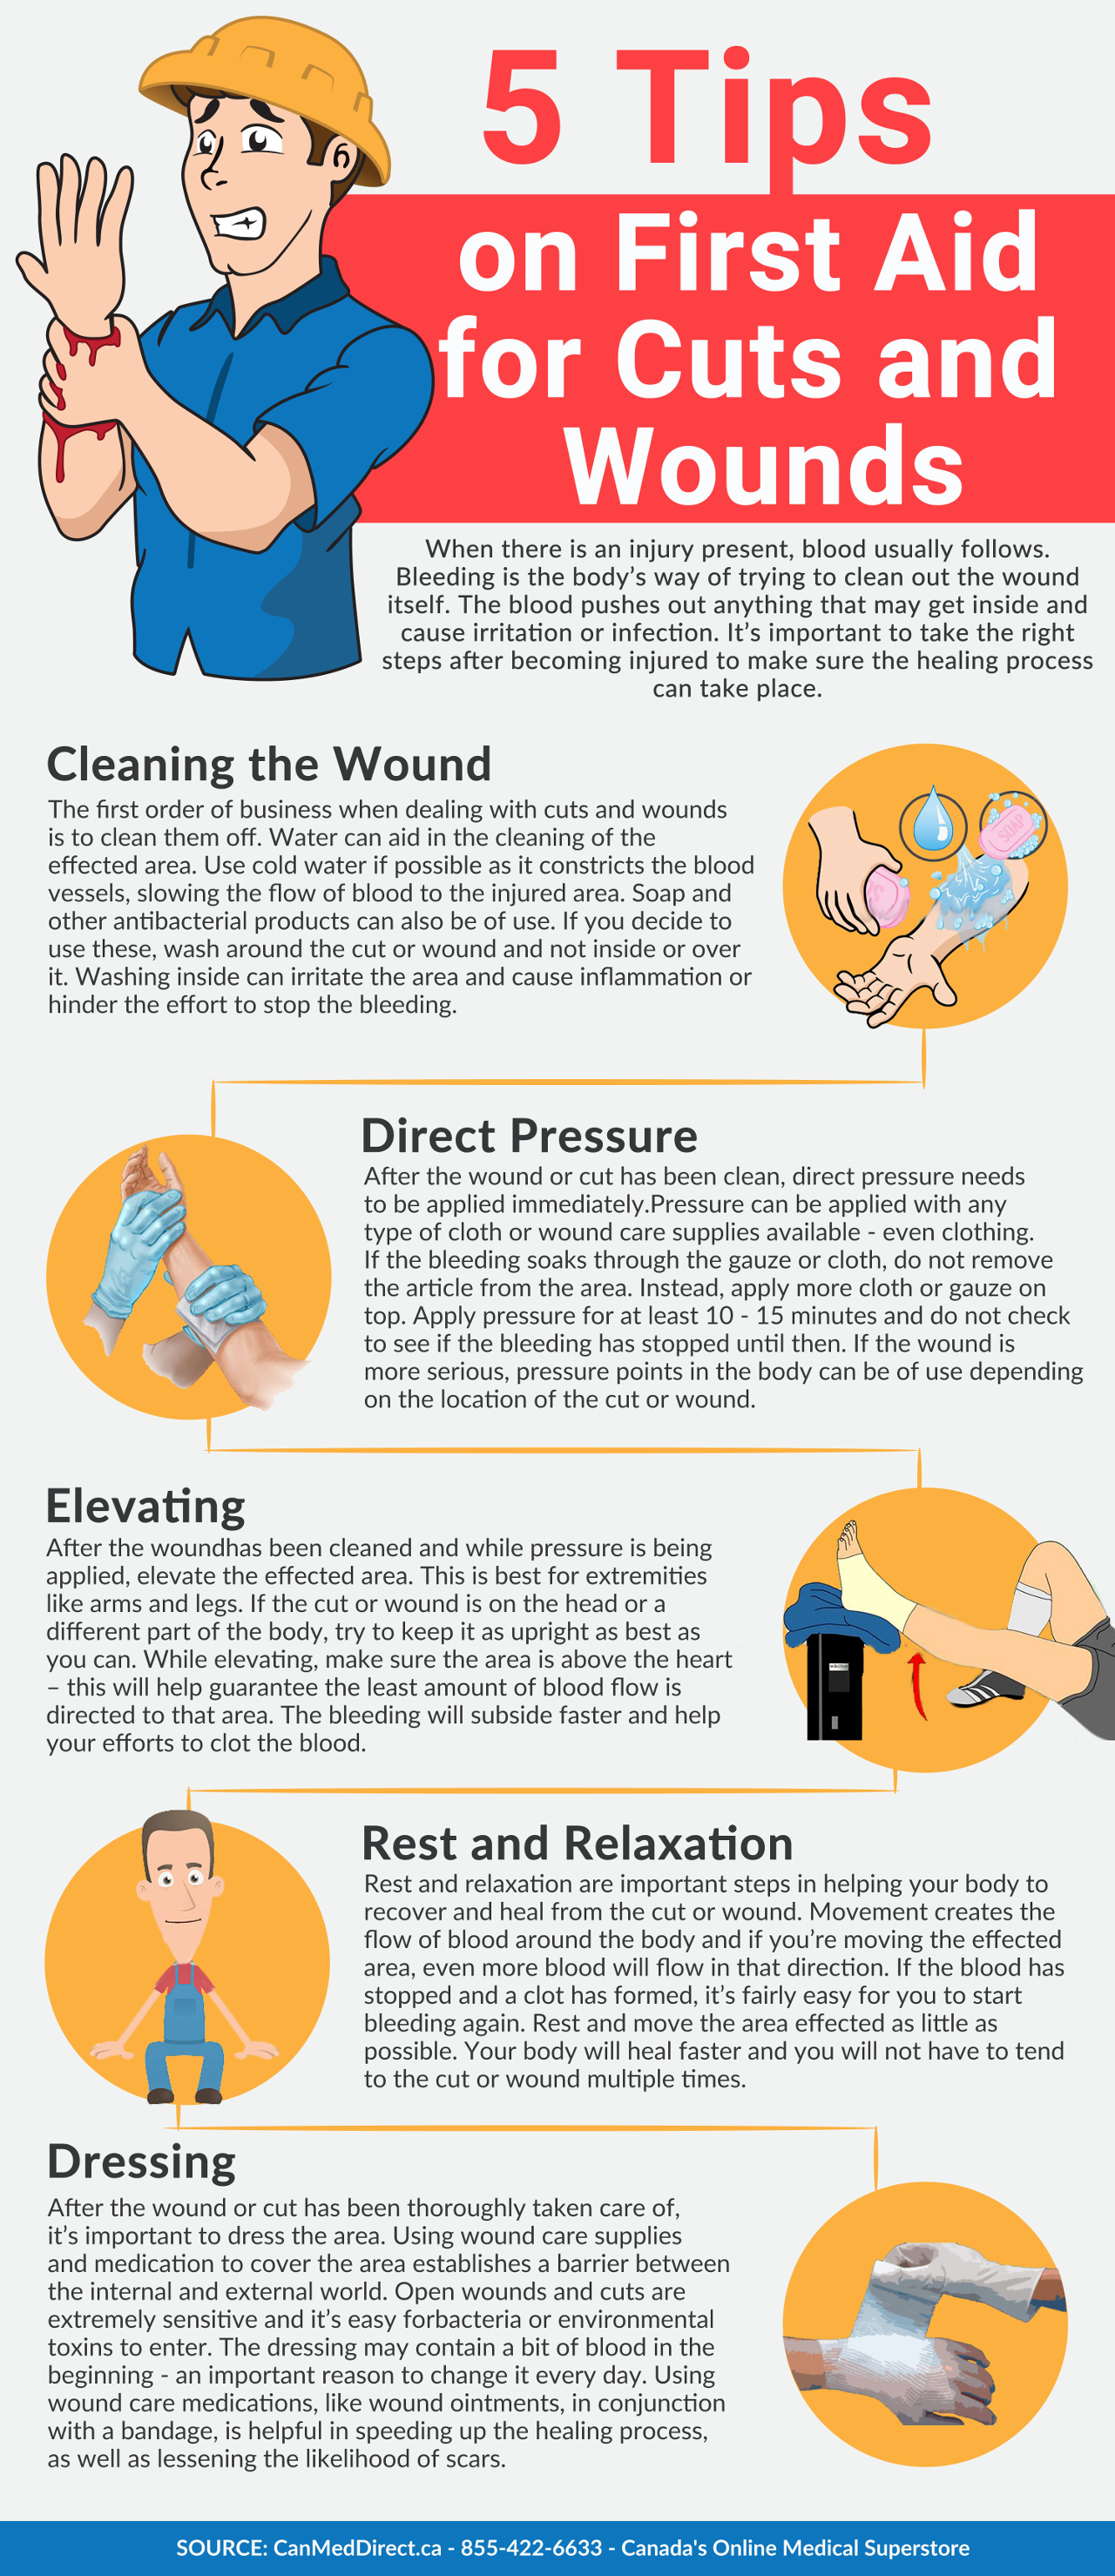 5 Writing Exercises to Help Heal Pain